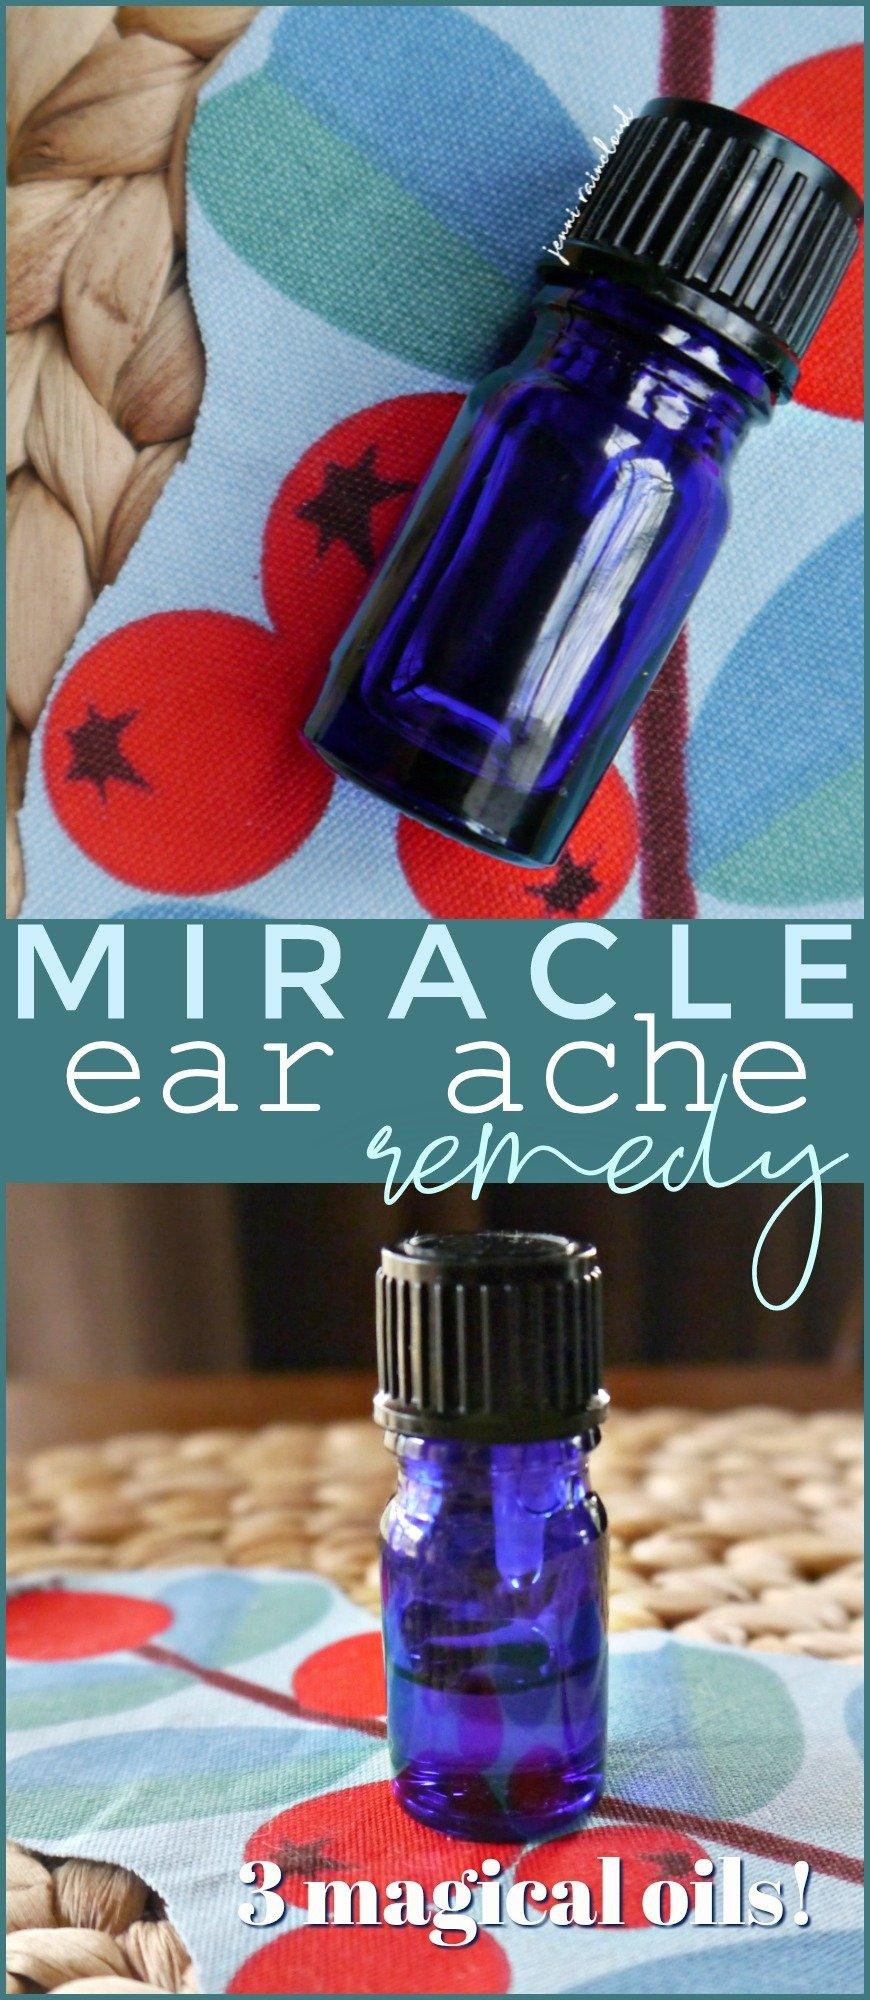 Ear Ache Remedy